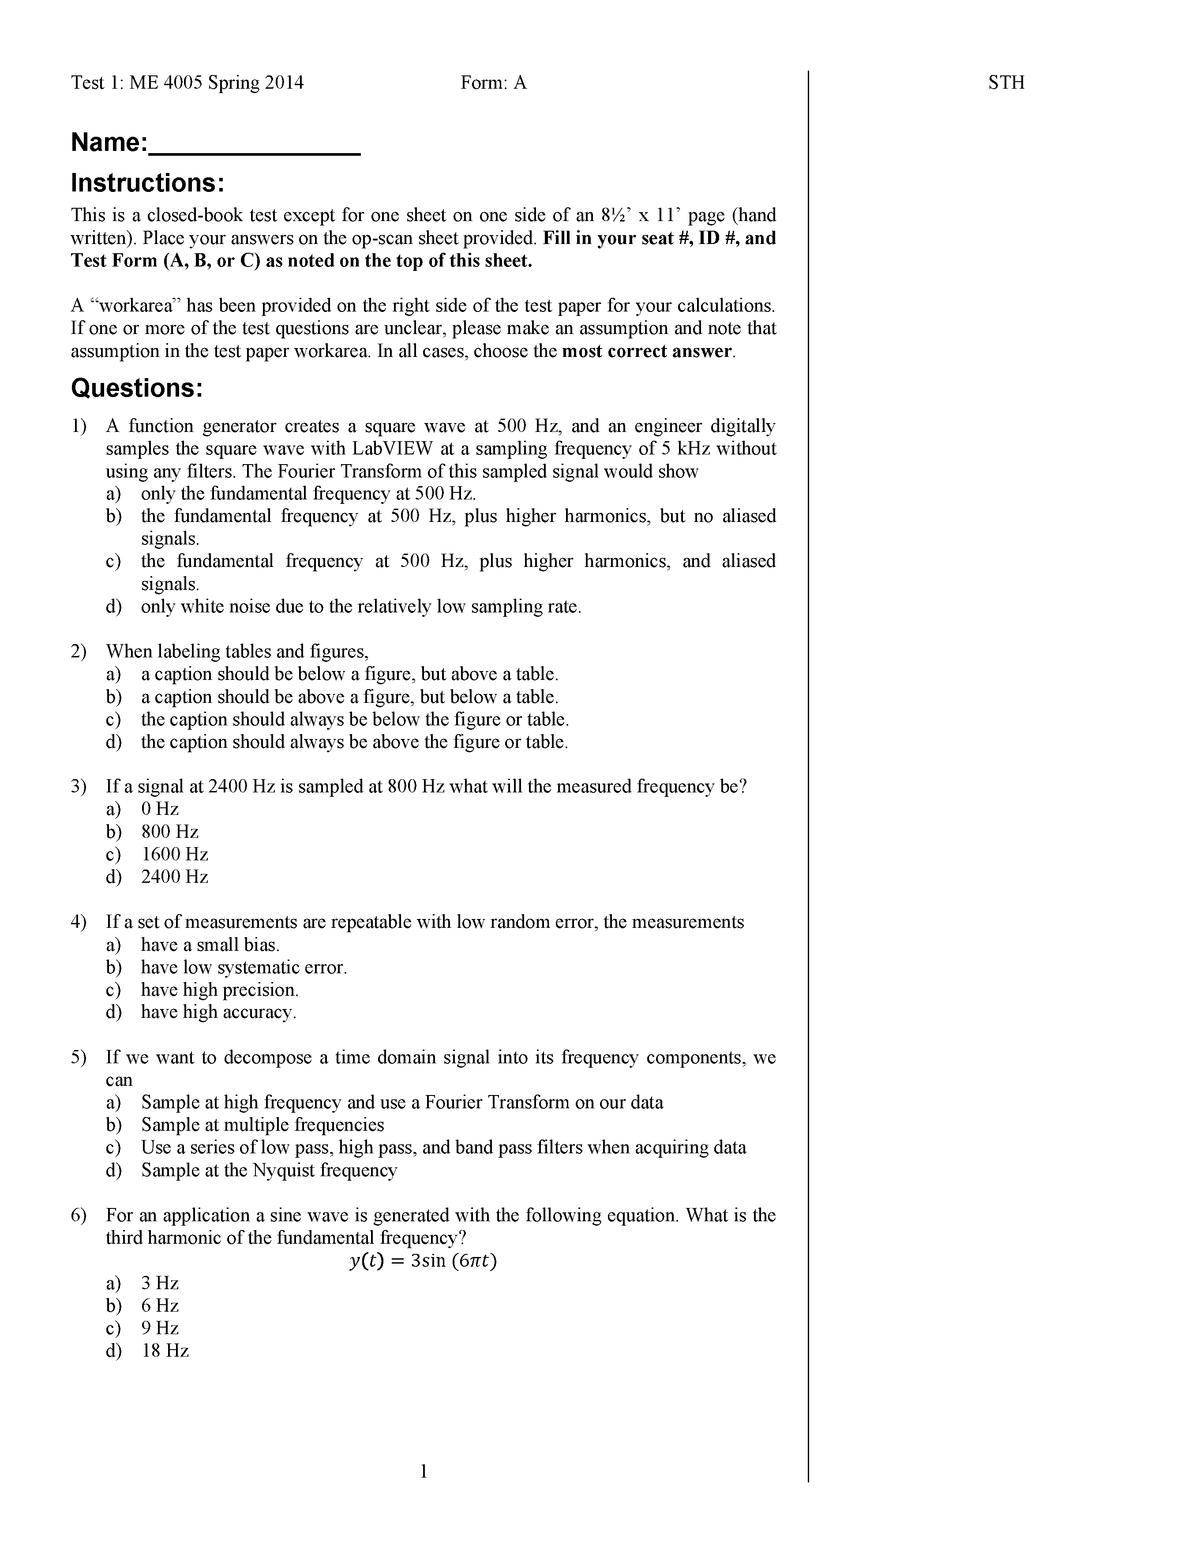 Exam 2014 - ME 4005: Mechanical Engineering Lab - StuDocu